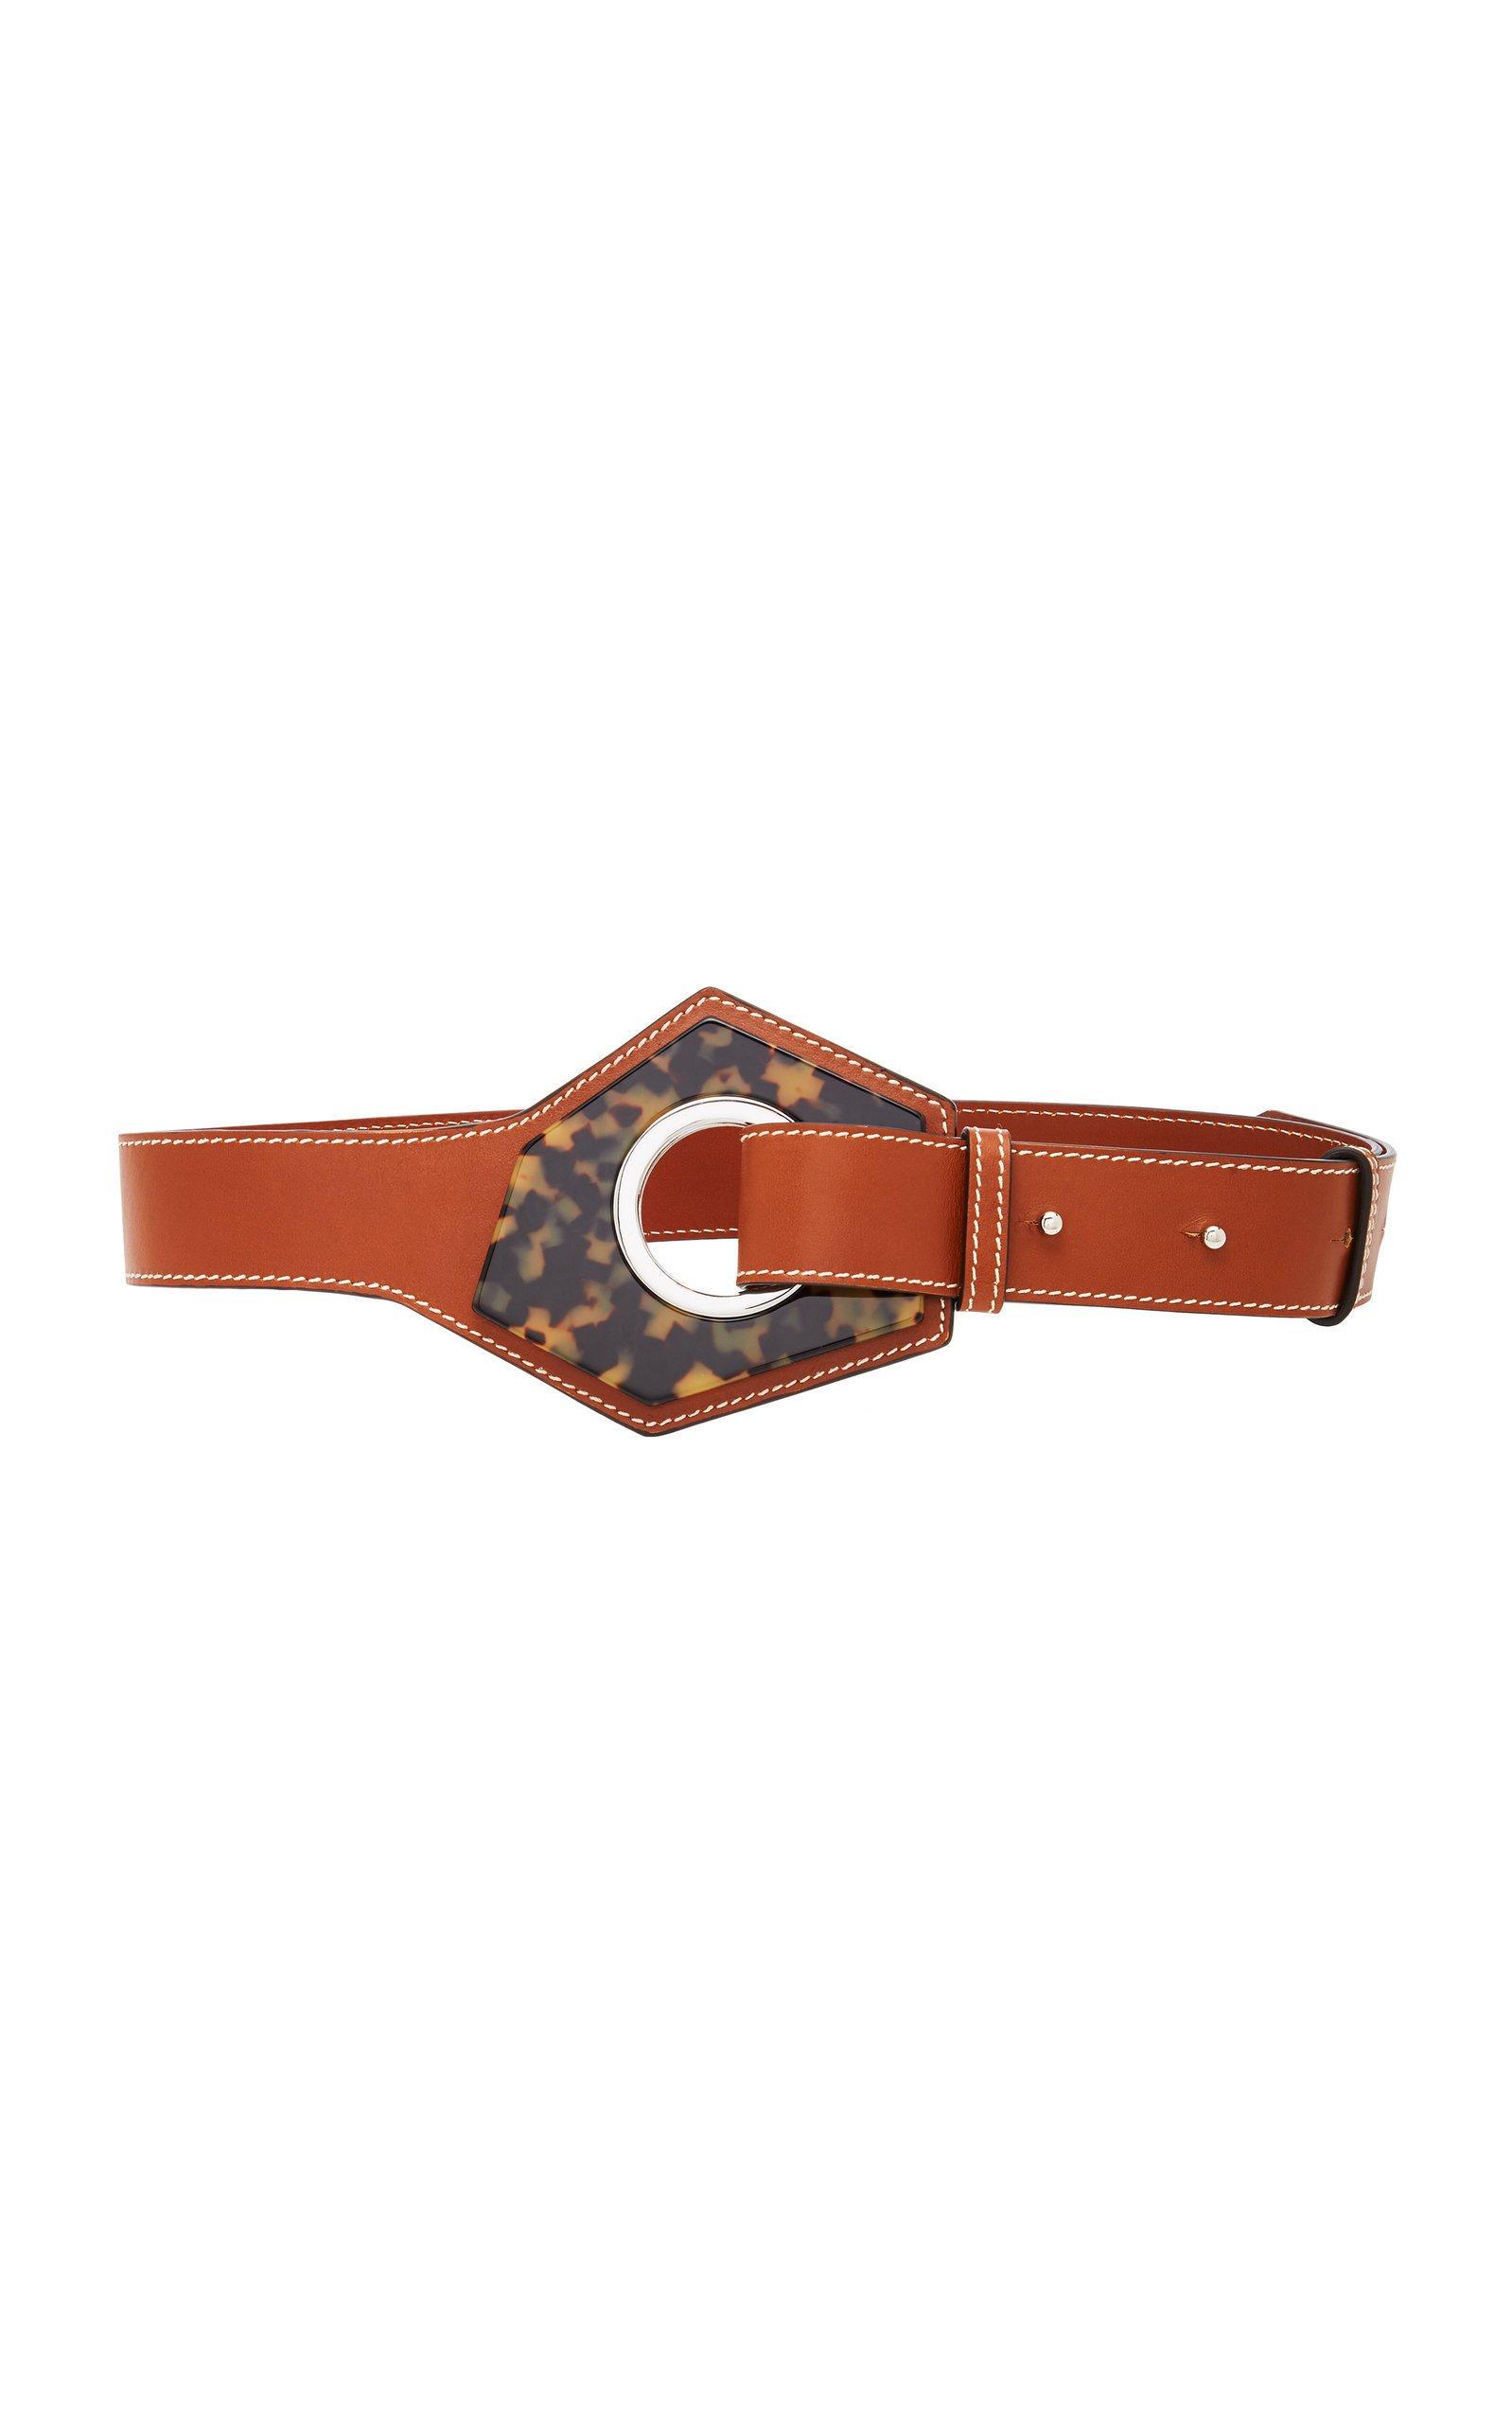 Ganni Leather and Hexagonal Buckle Belt